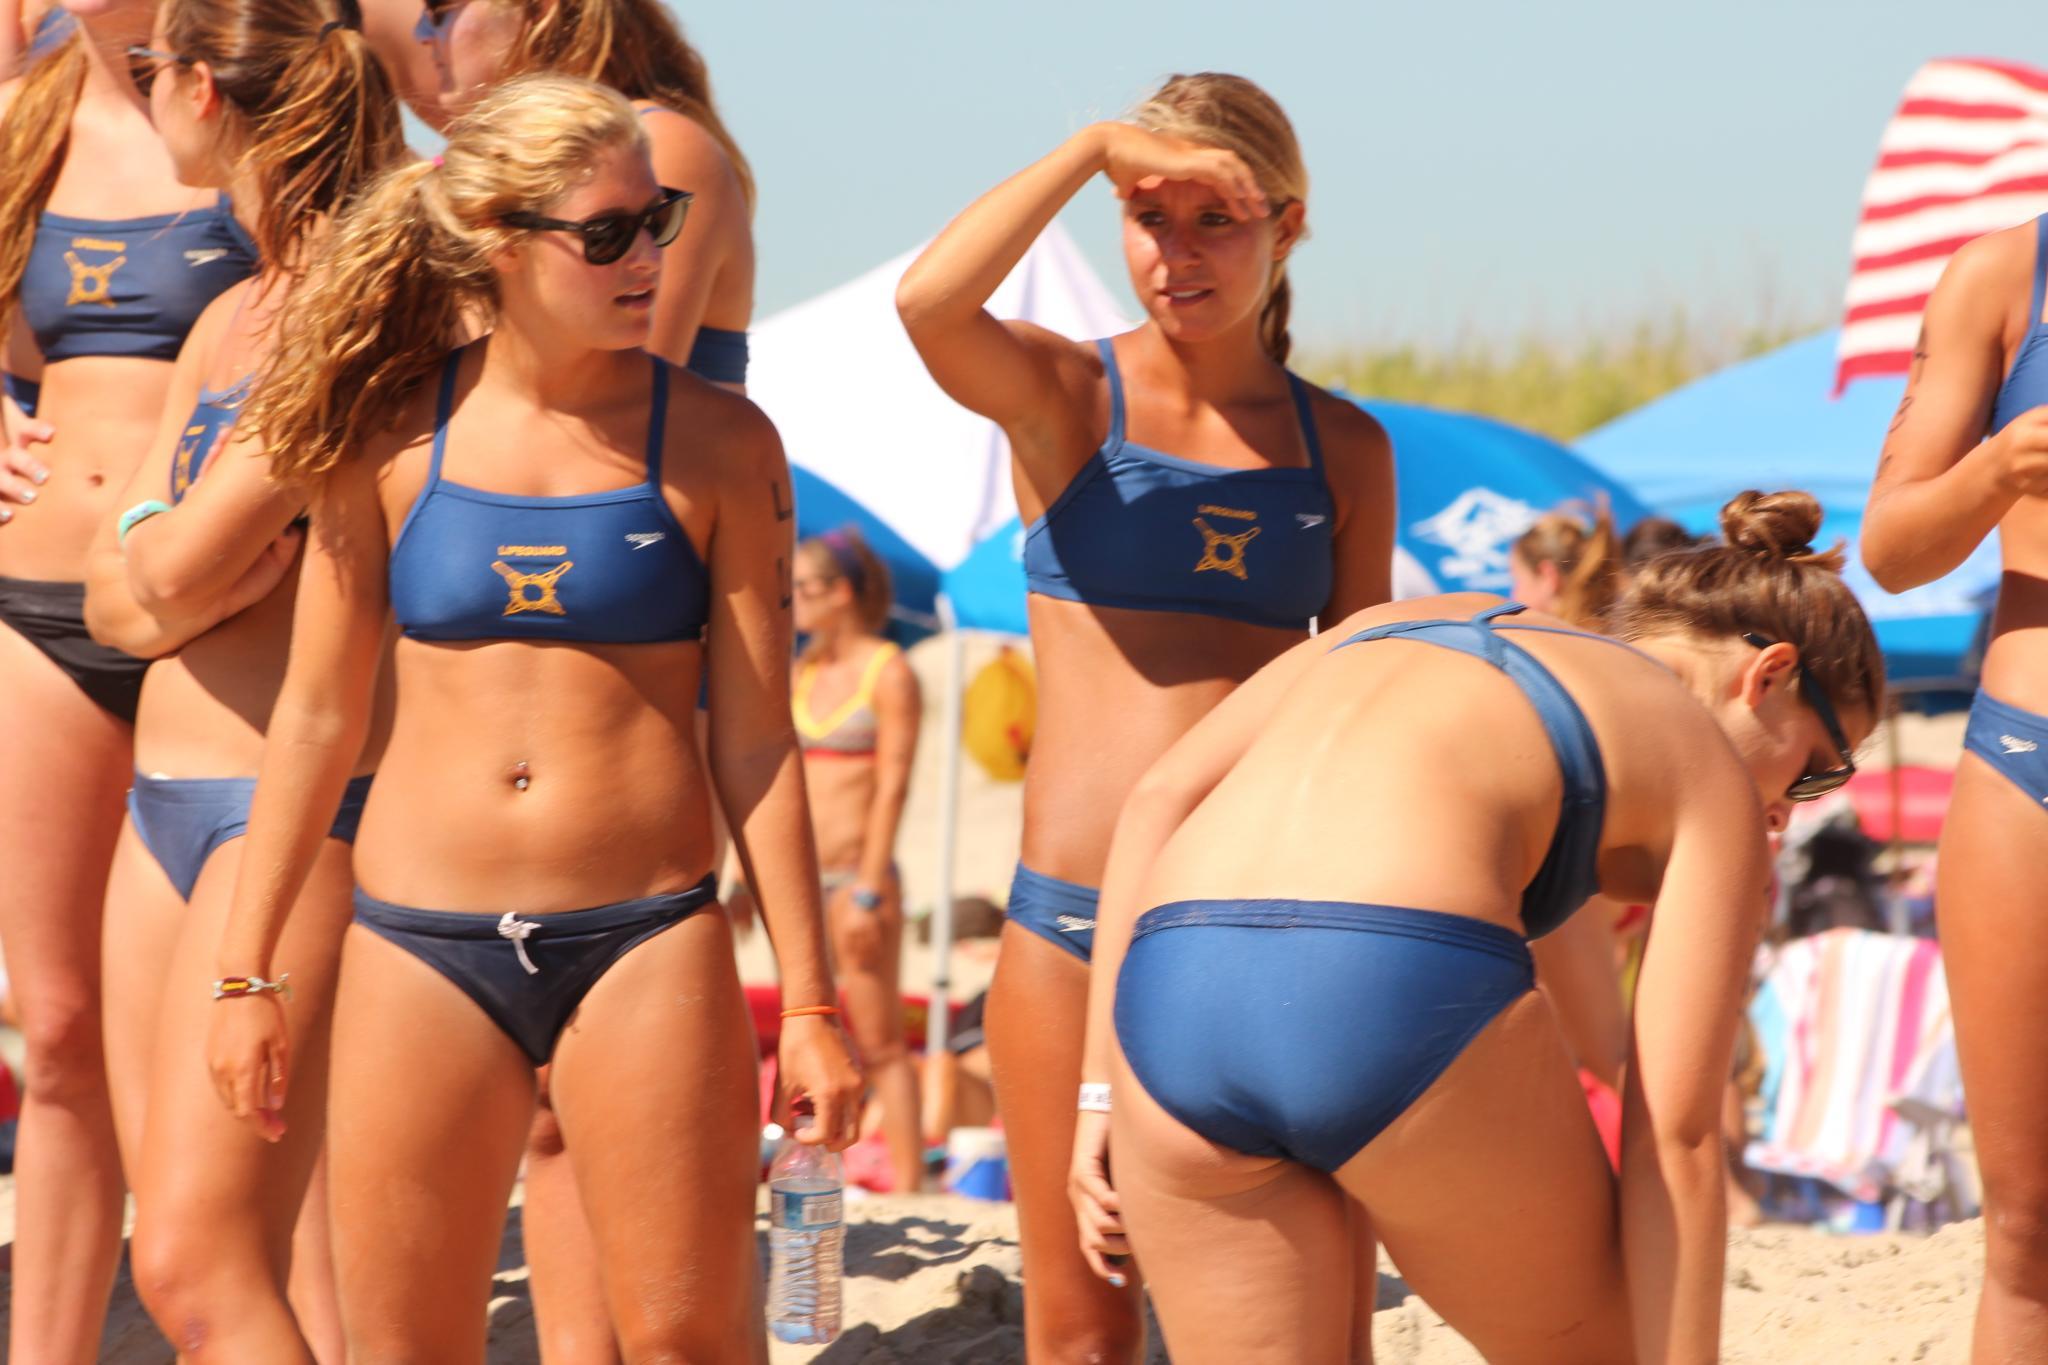 jessica alba sexiest picture